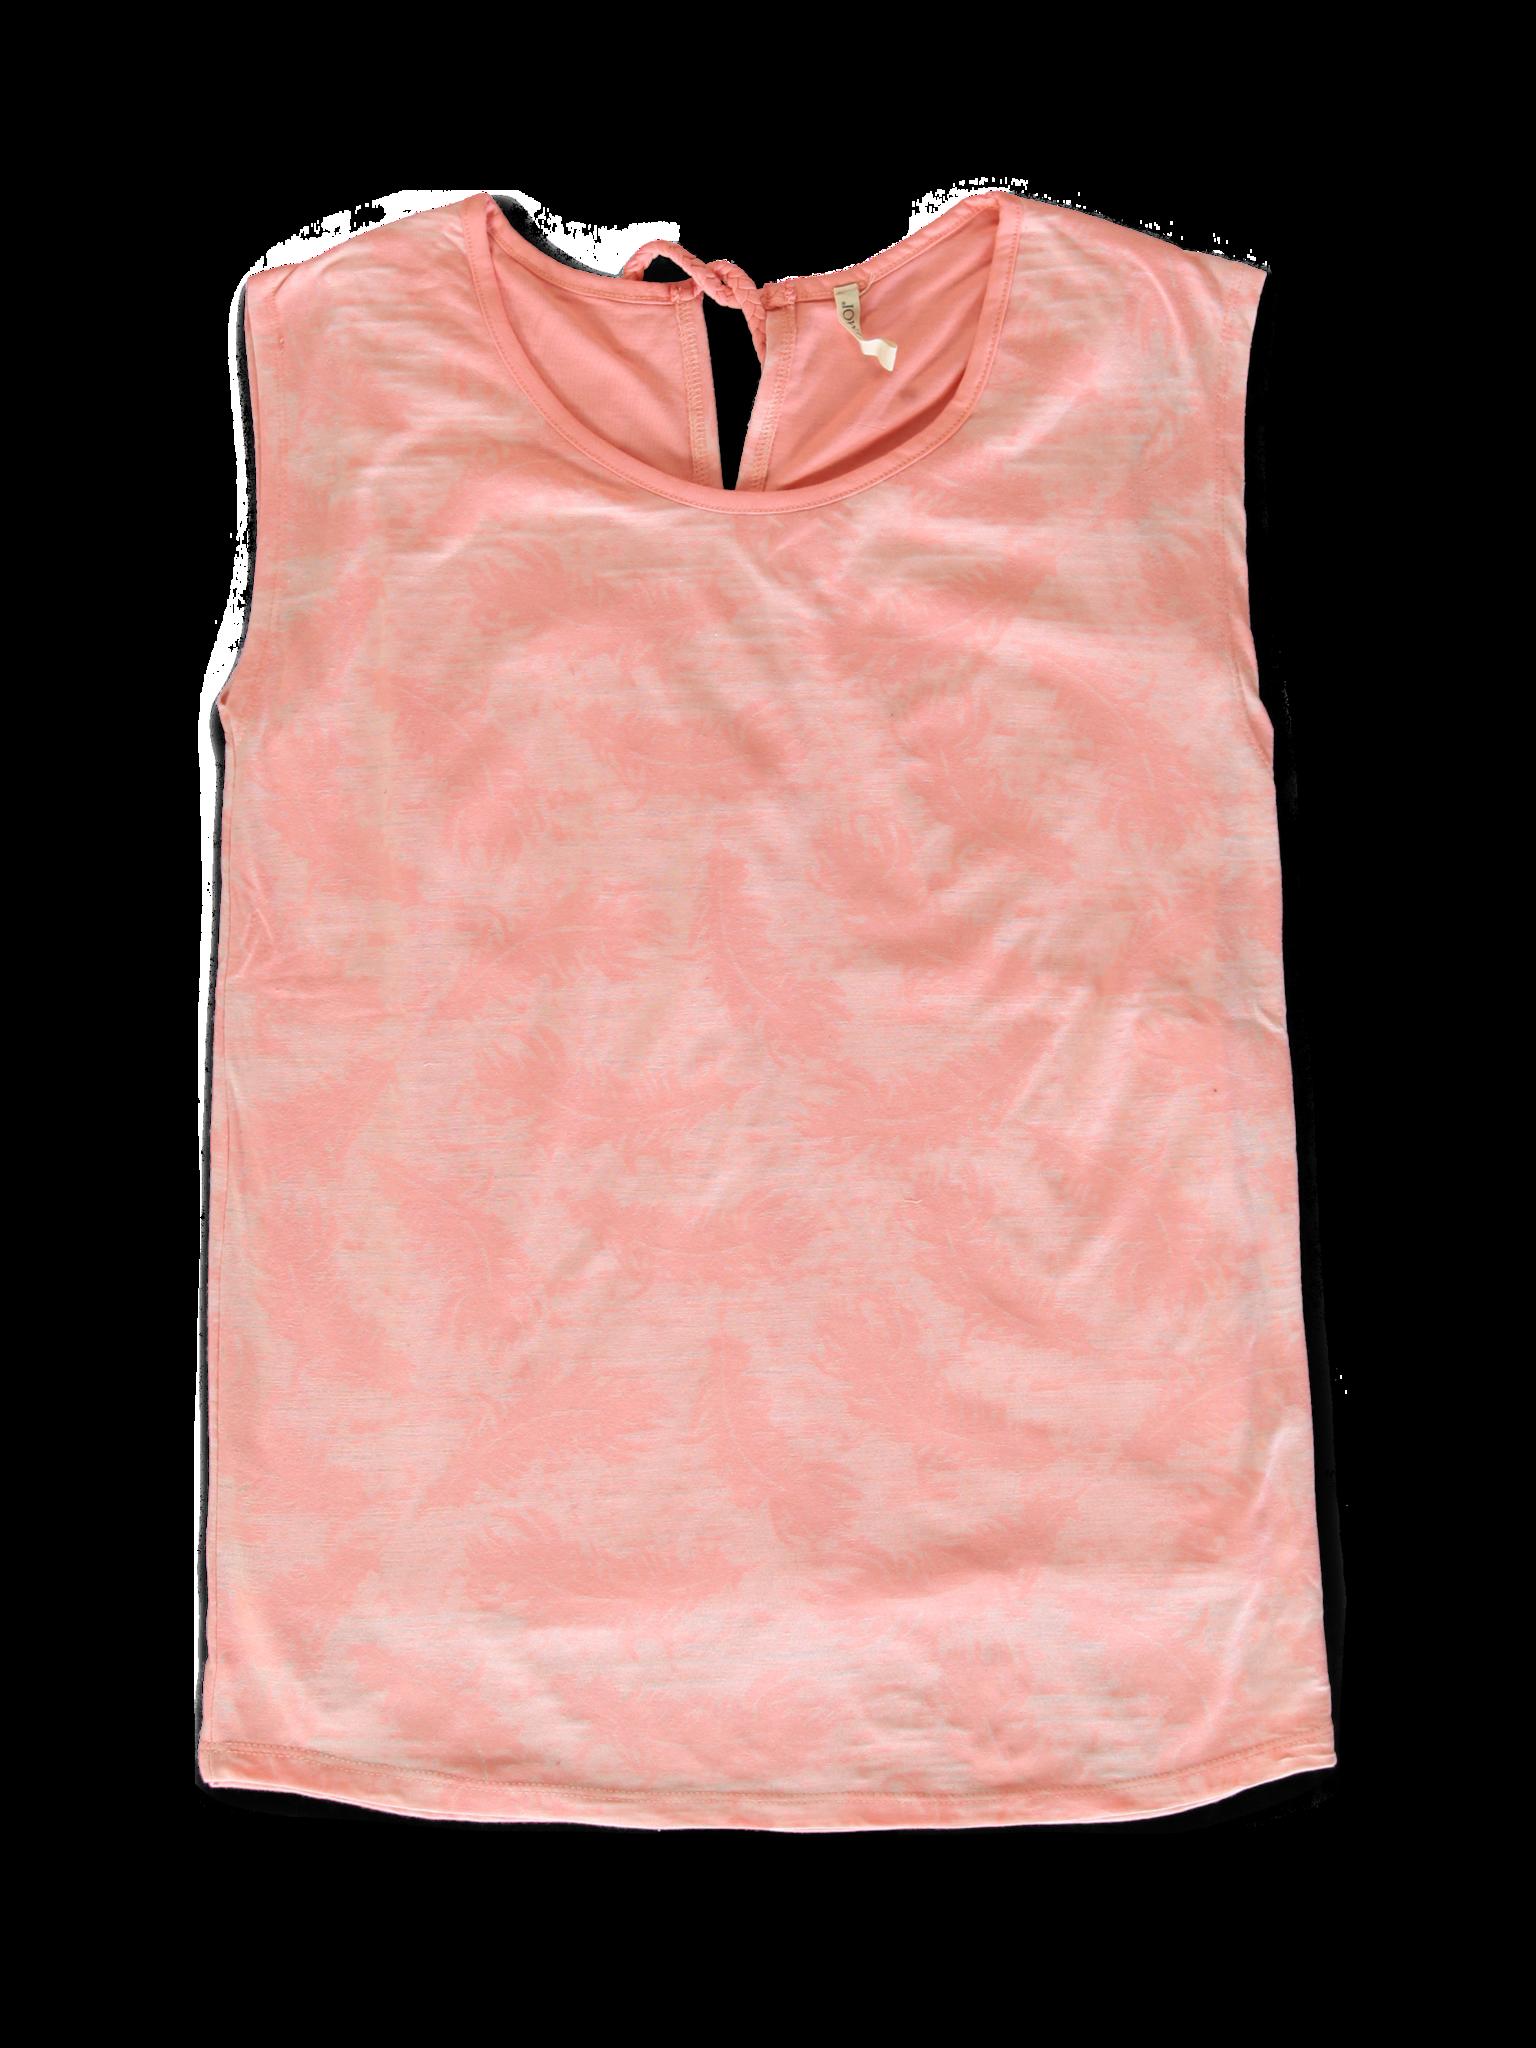 All Brands | Summerproducts Ladies | T-shirt | 18 pcs/box